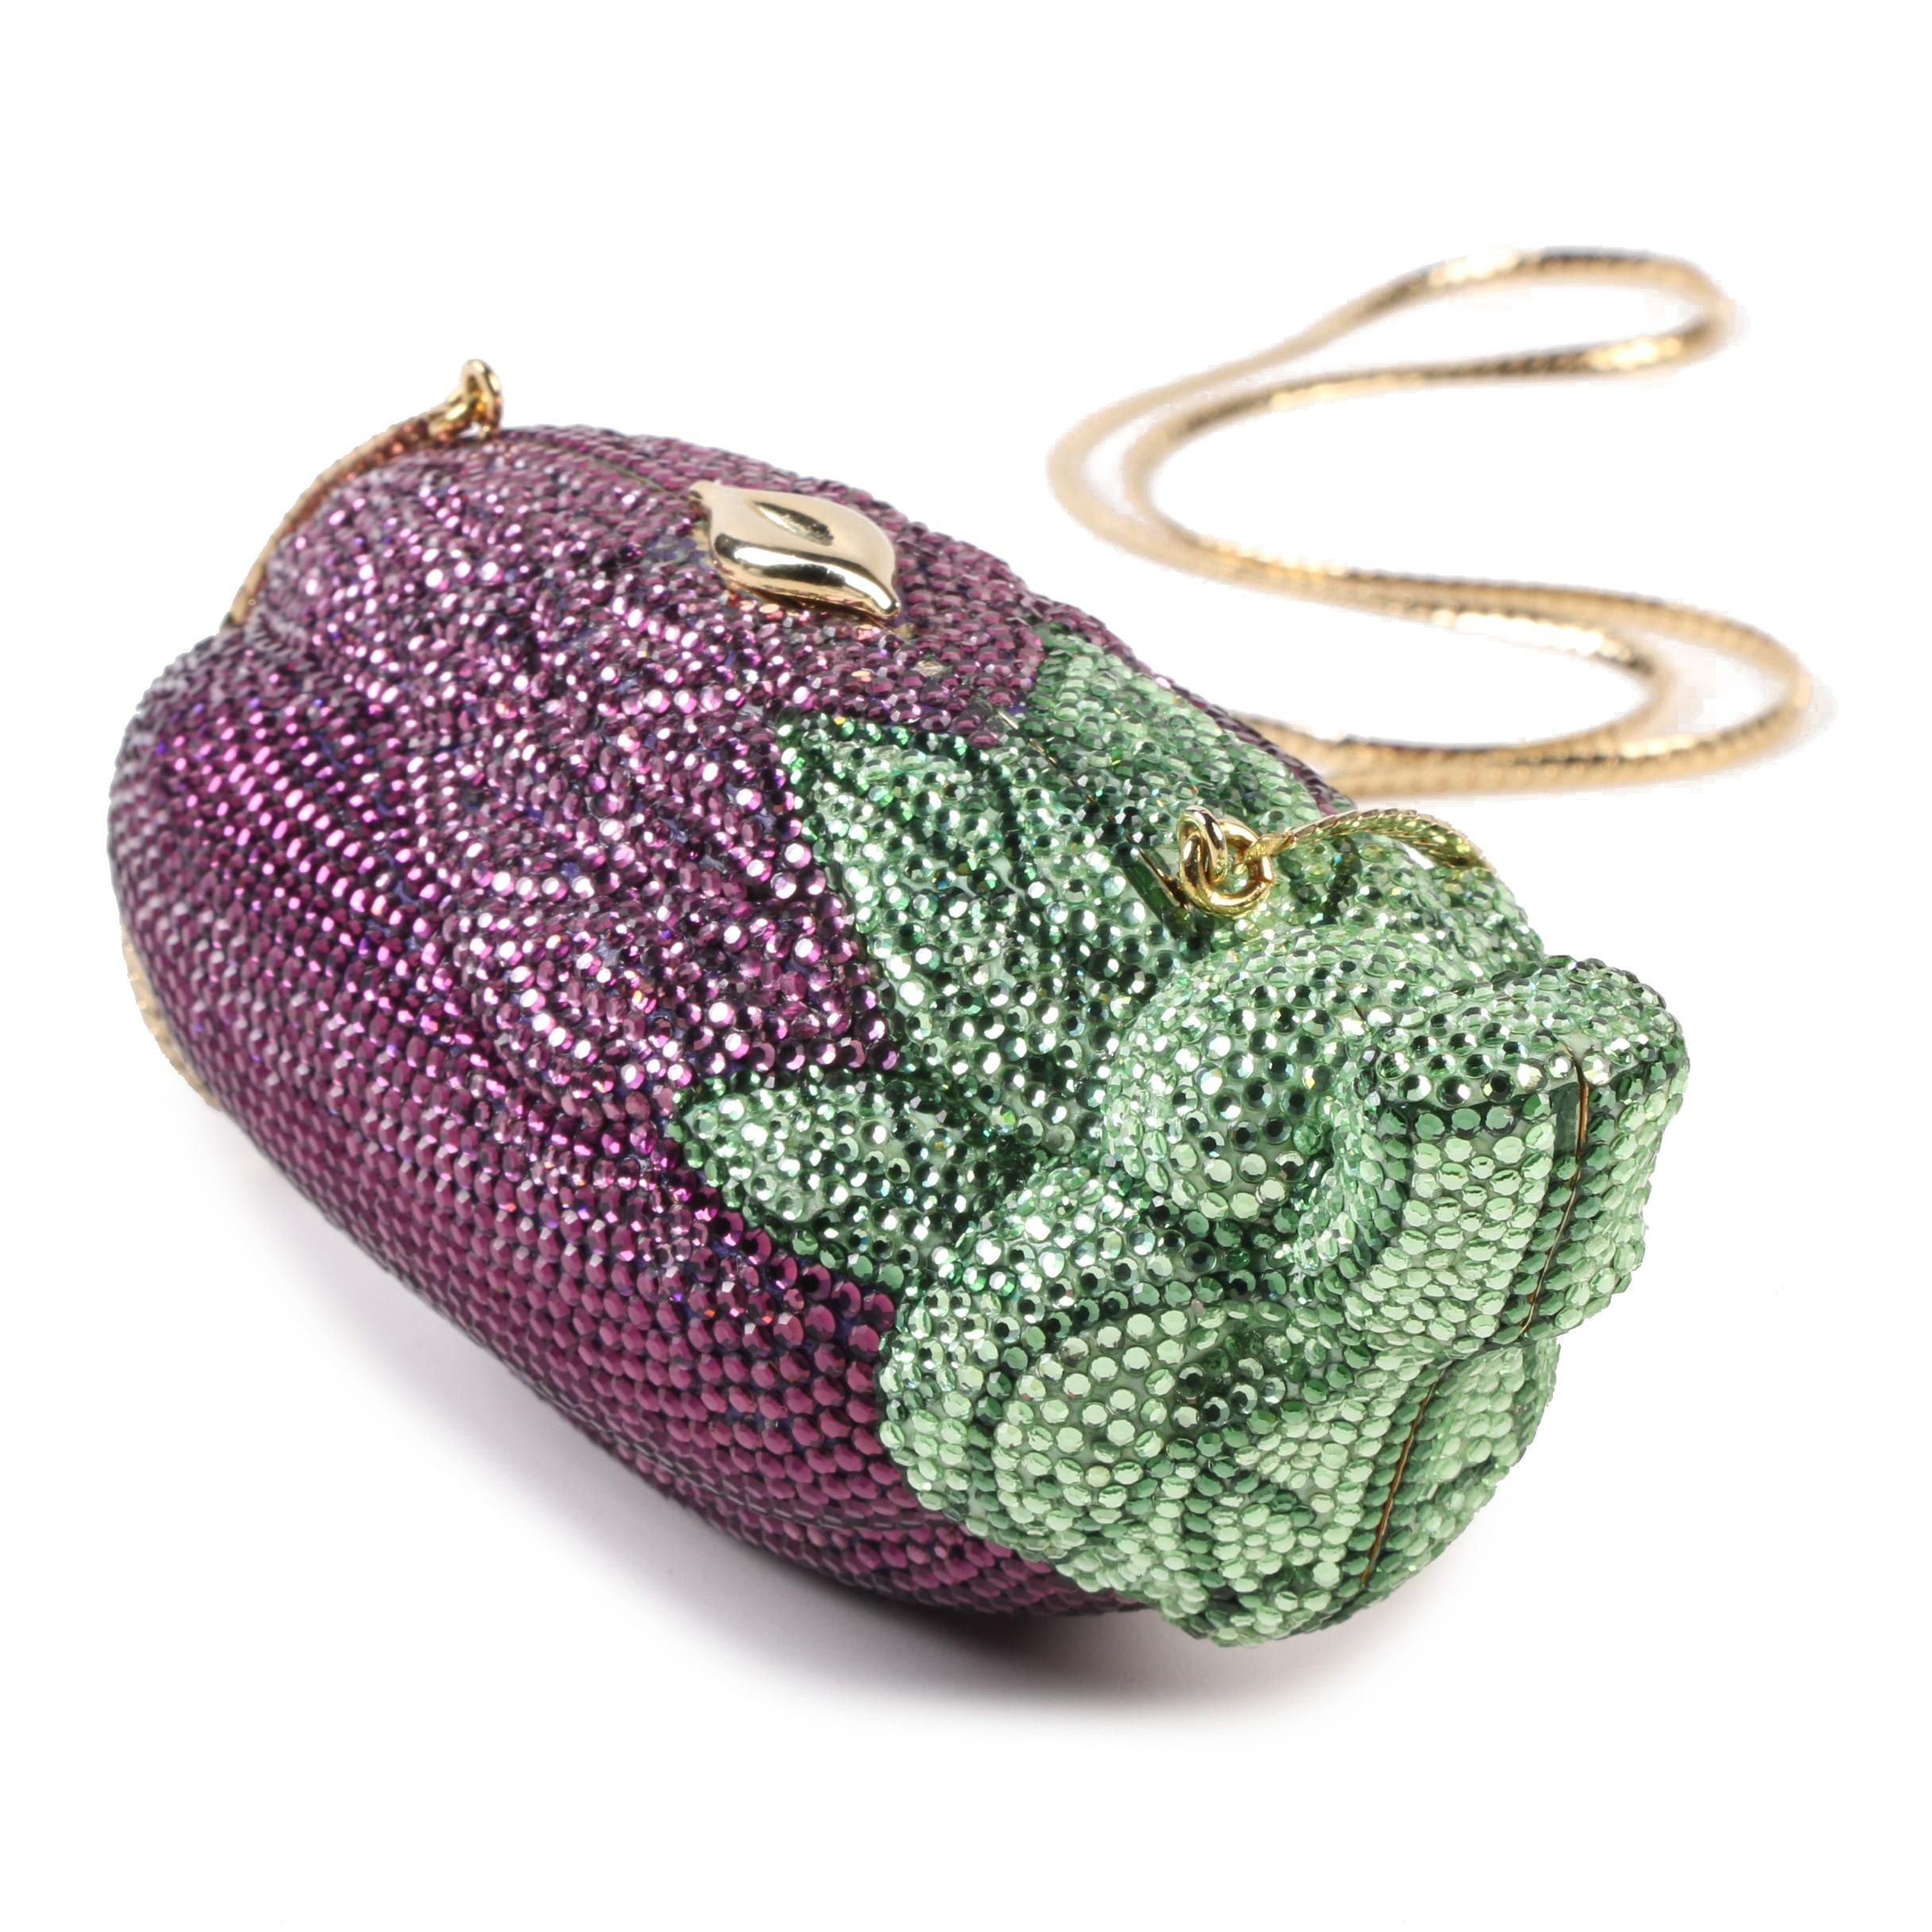 Judith Leiber Austrian Crystal Eggplant Minaudière Evening Bag with Snake Chain